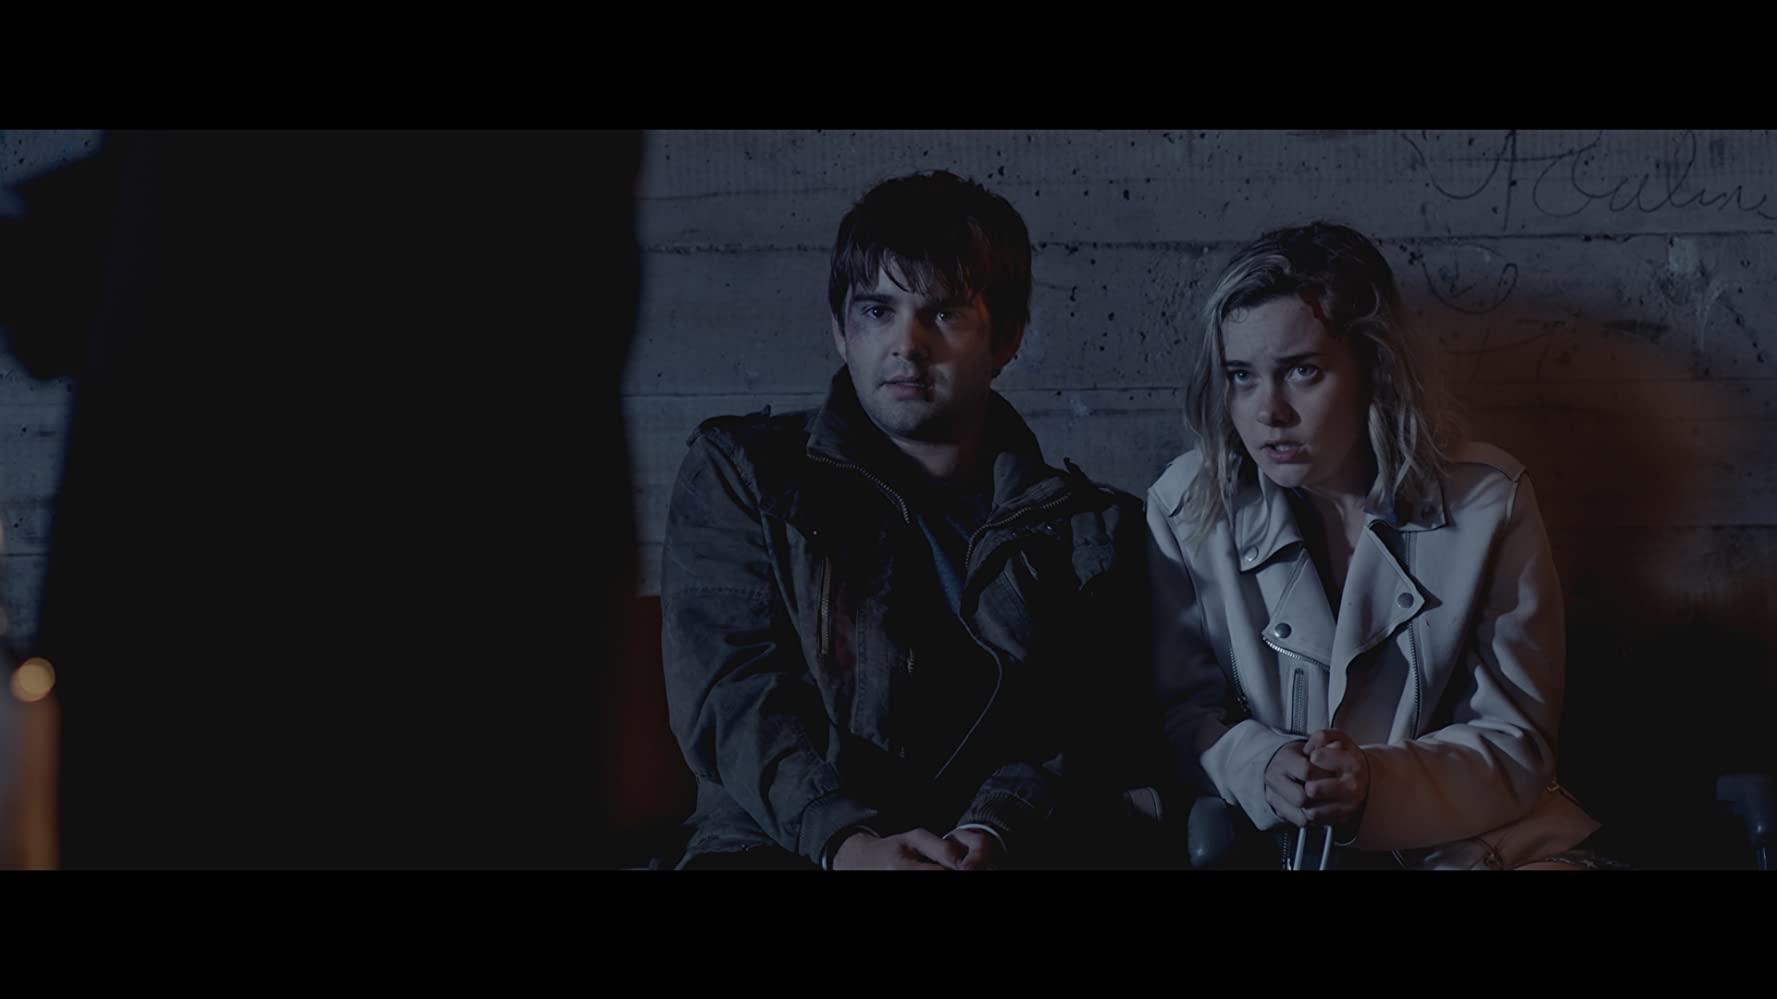 مشاهدة فيلم The 2nd (2020) مترجم HD اون لاين